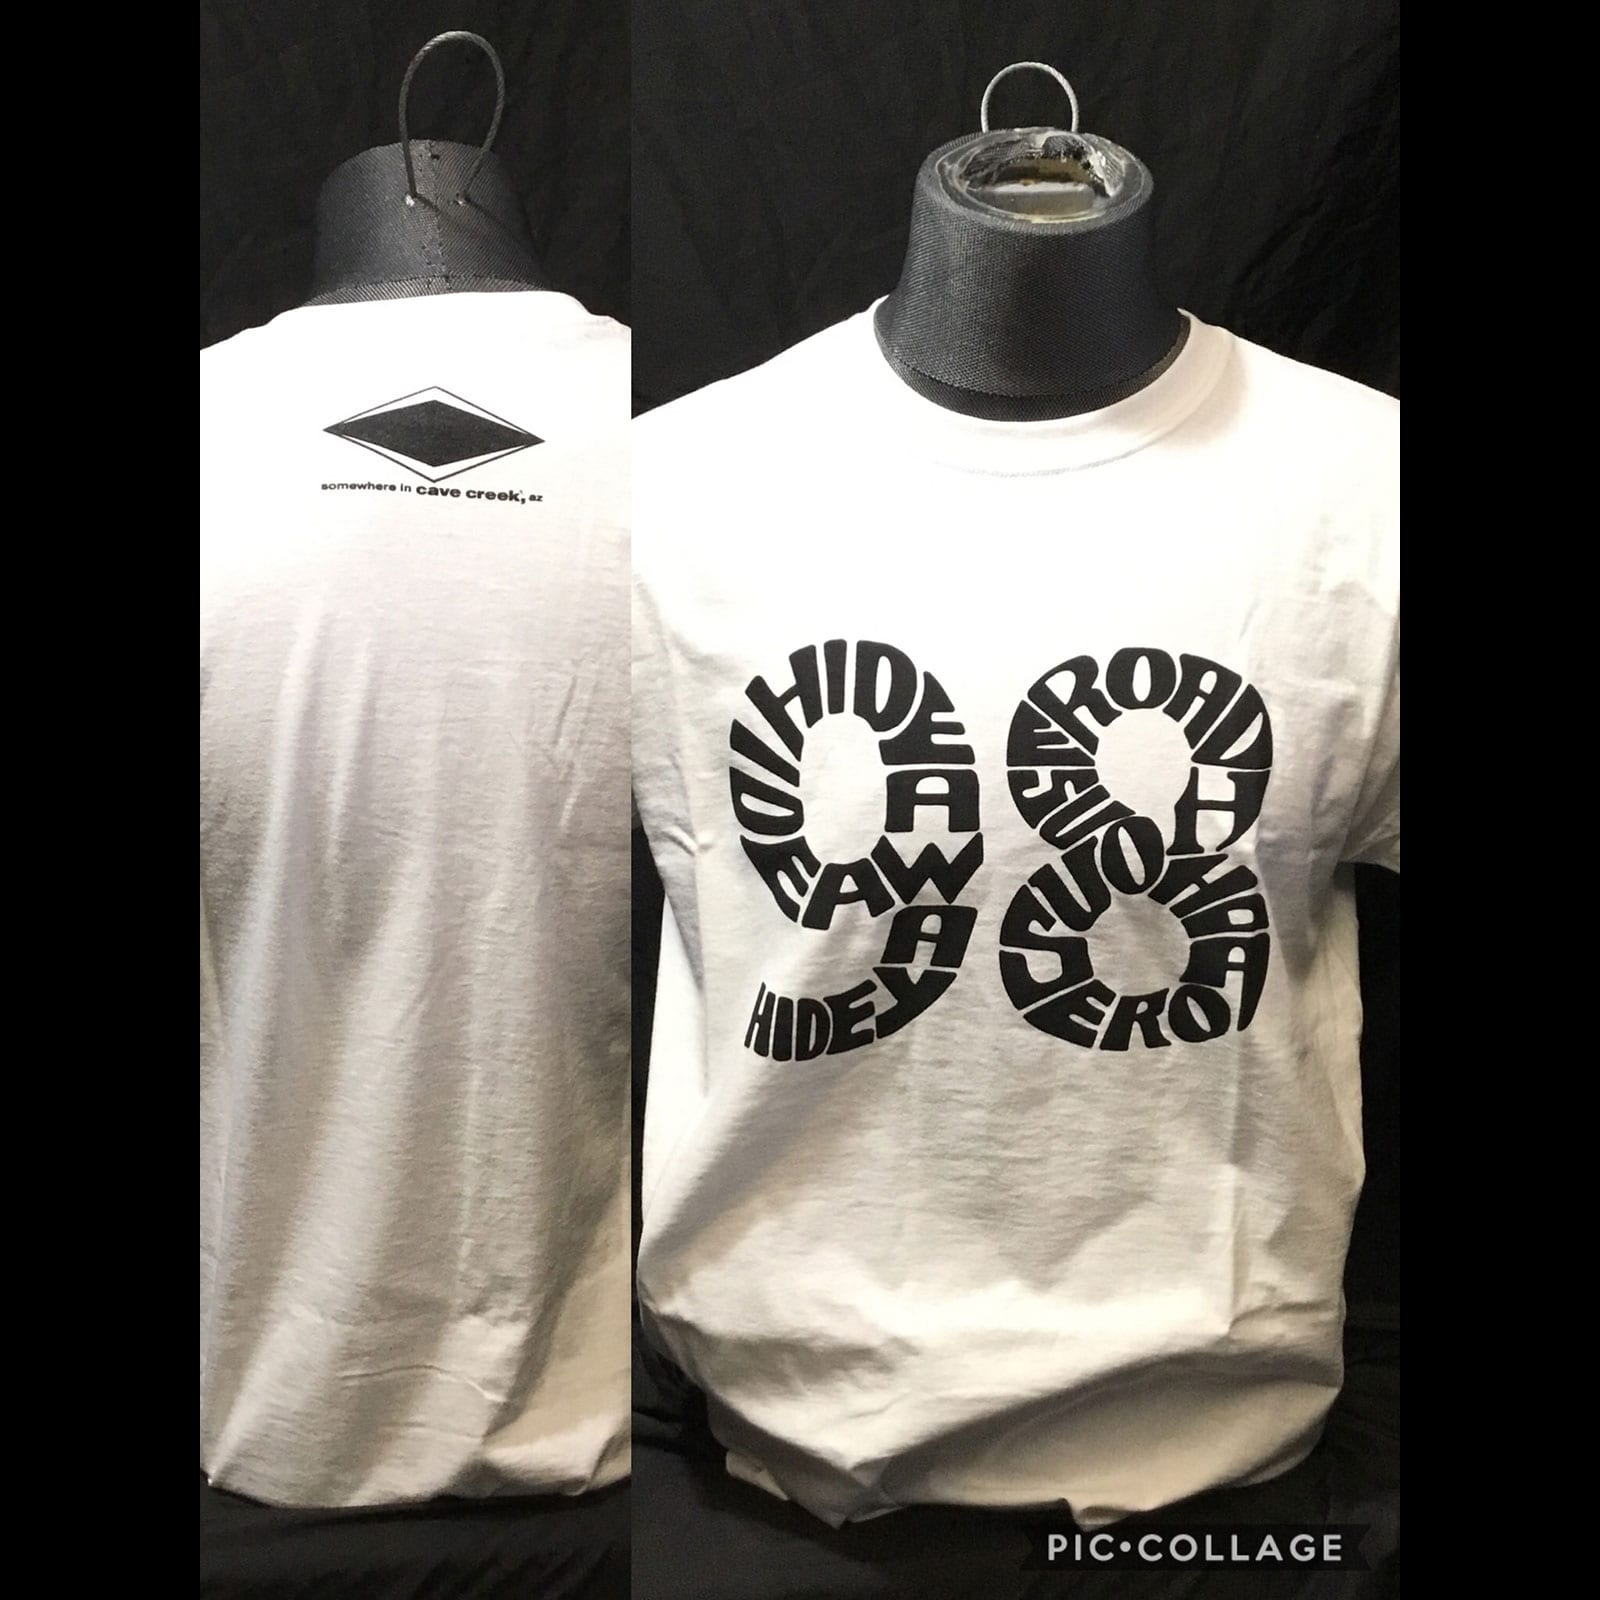 Hideaway: Men's 98 Short Sleeve Shirt - White